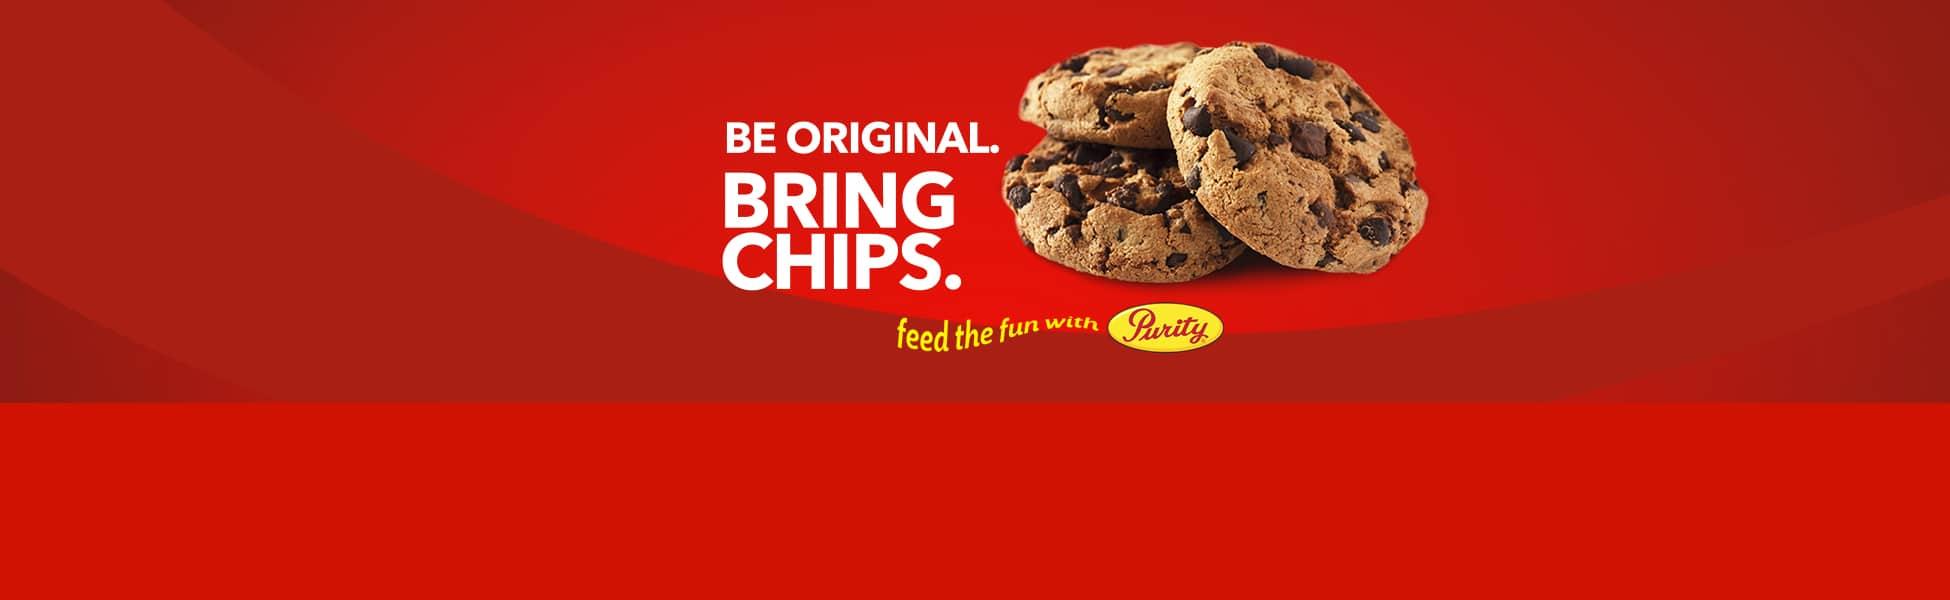 Be Original. Bring Chips.